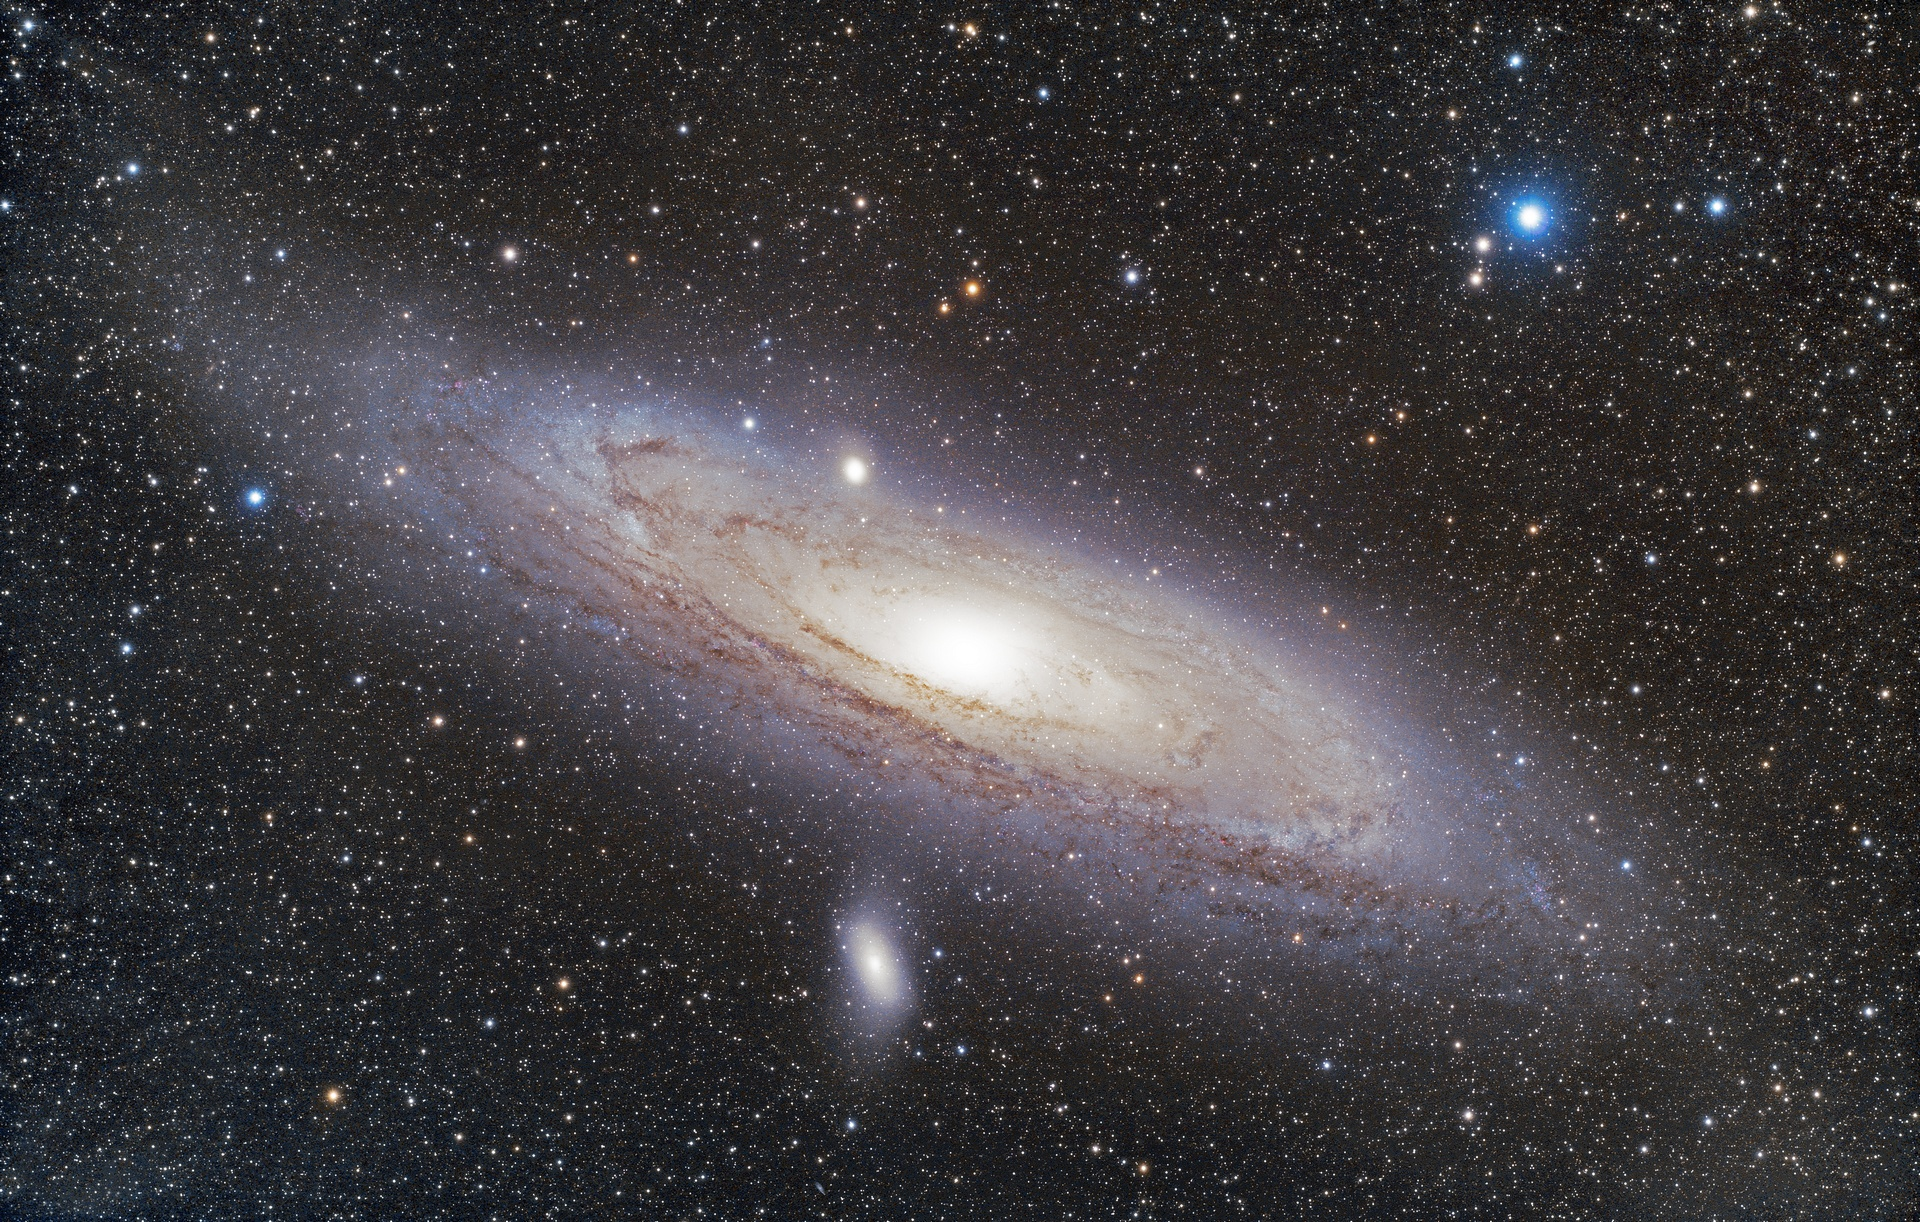 M31FSQ106-304x30s-3200iso-14082018c_t.jpg